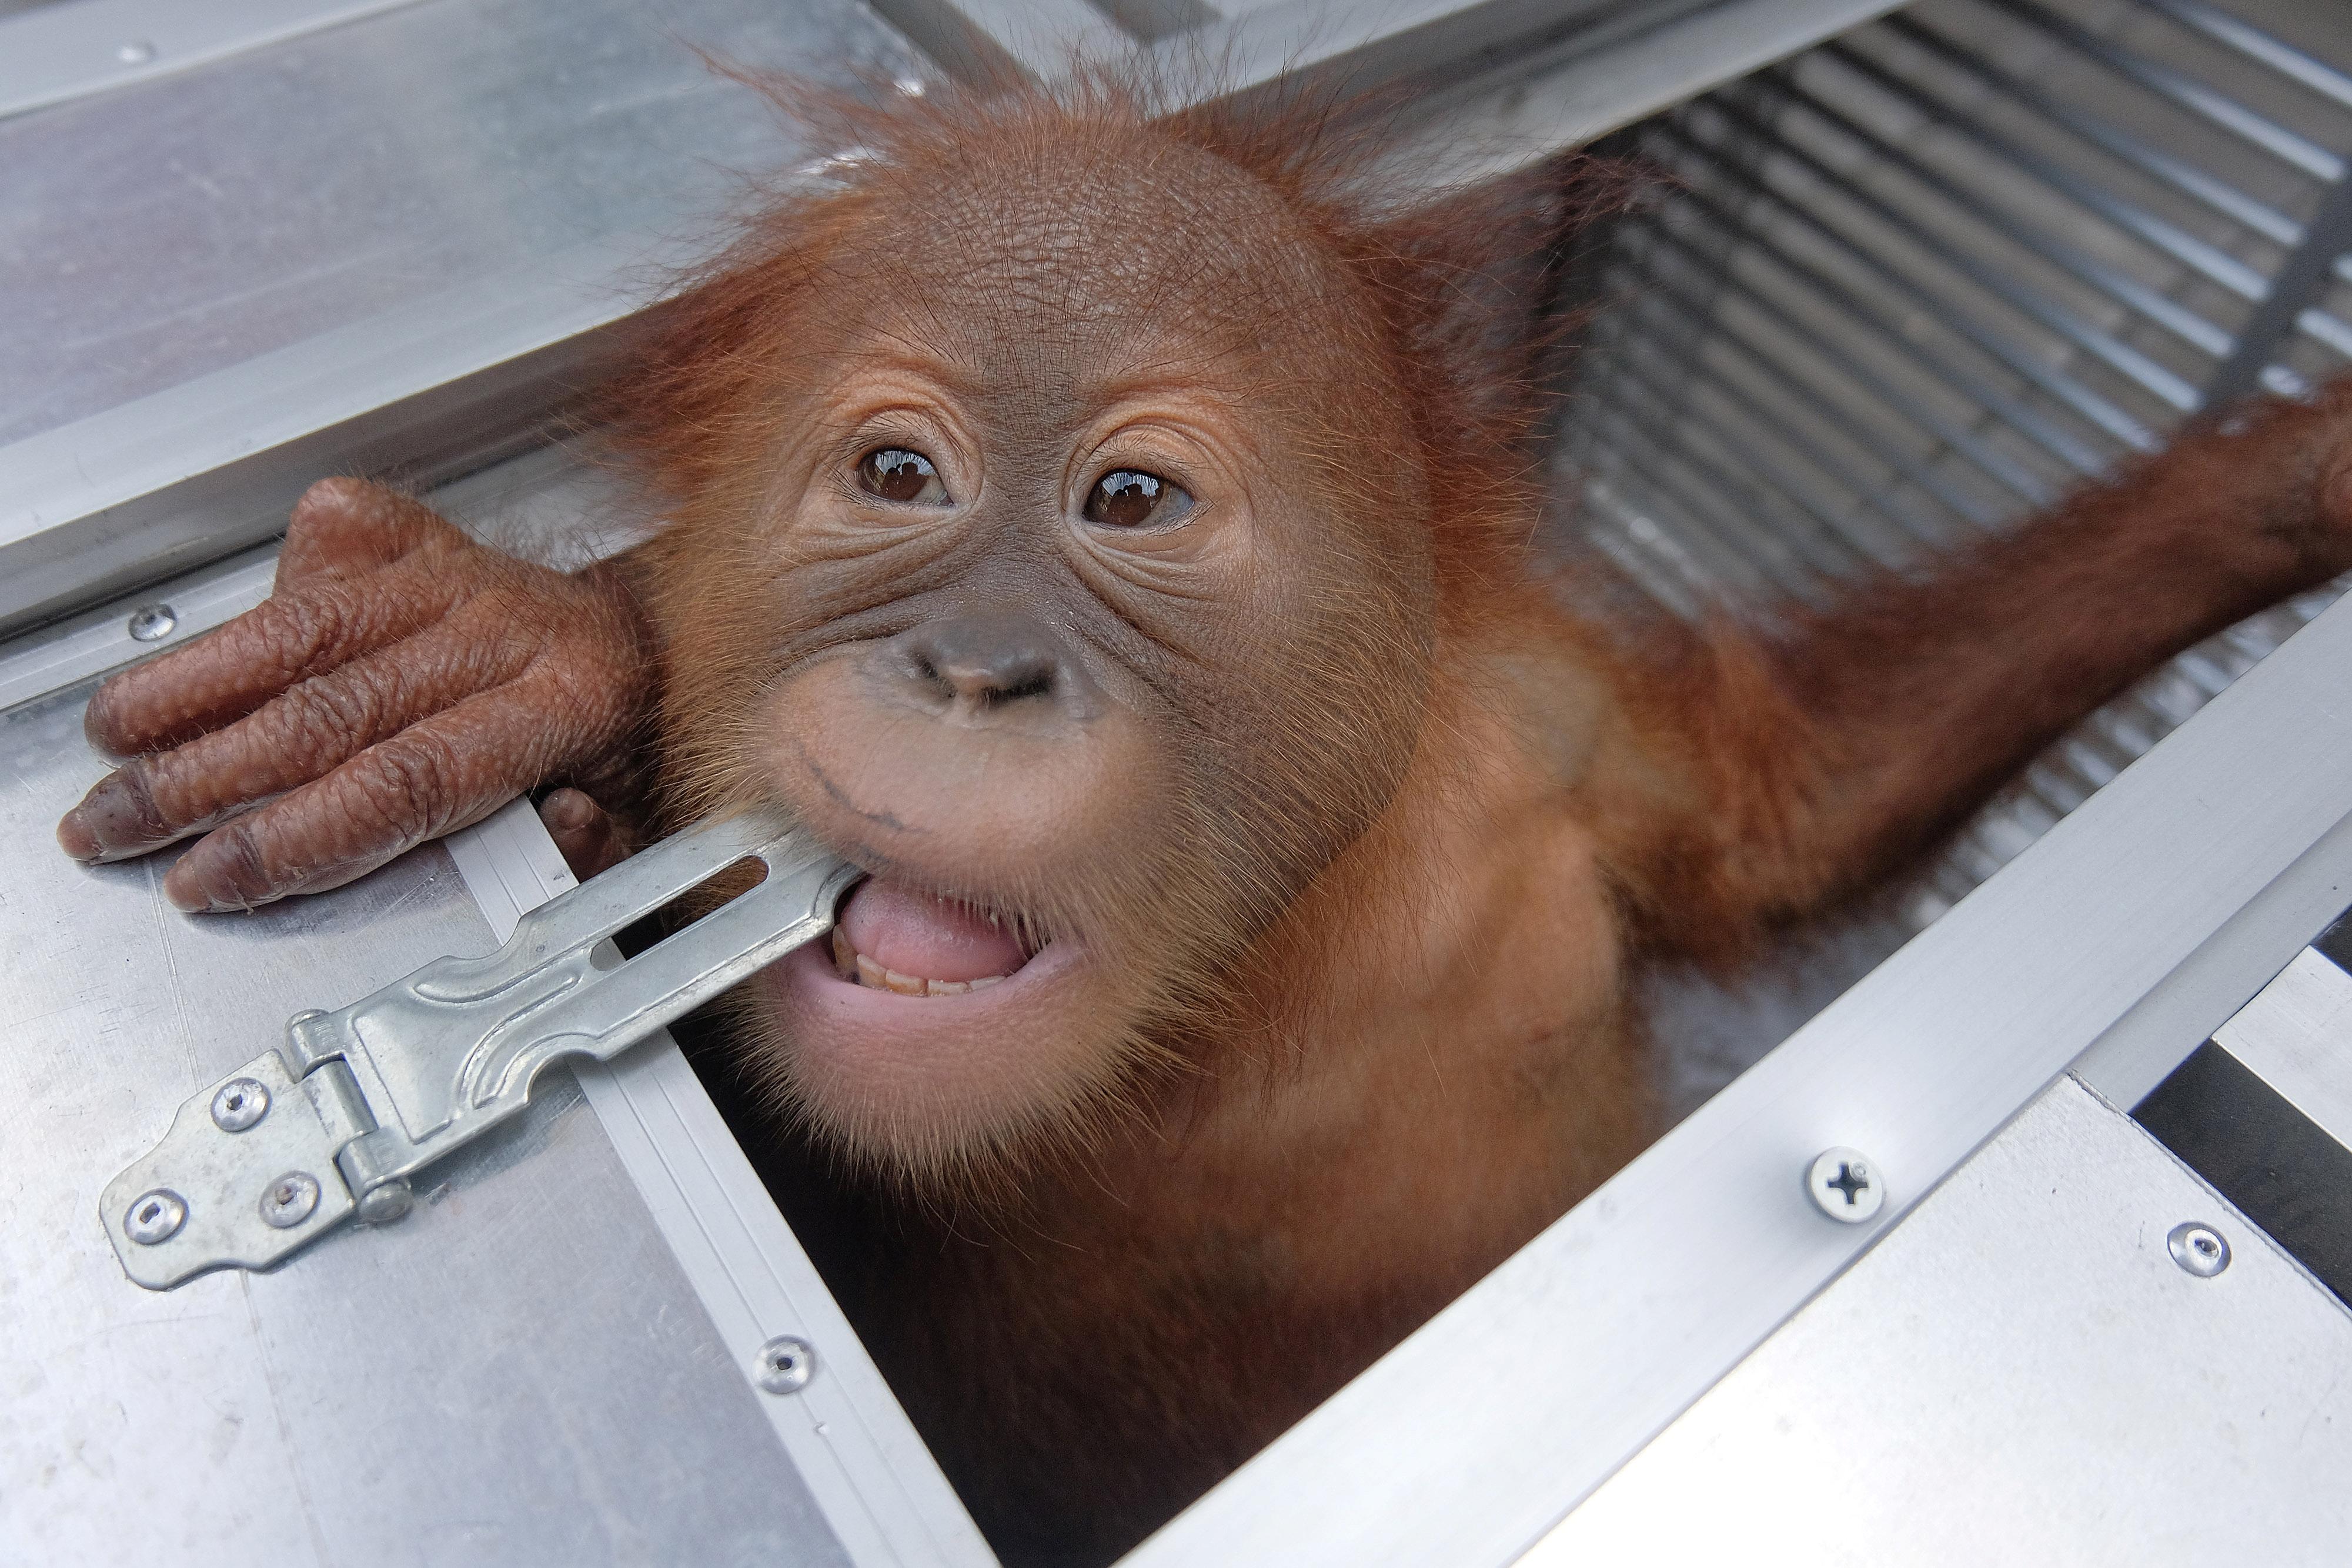 Indonesia detains Russian suspected of drugging, smuggling orangutan